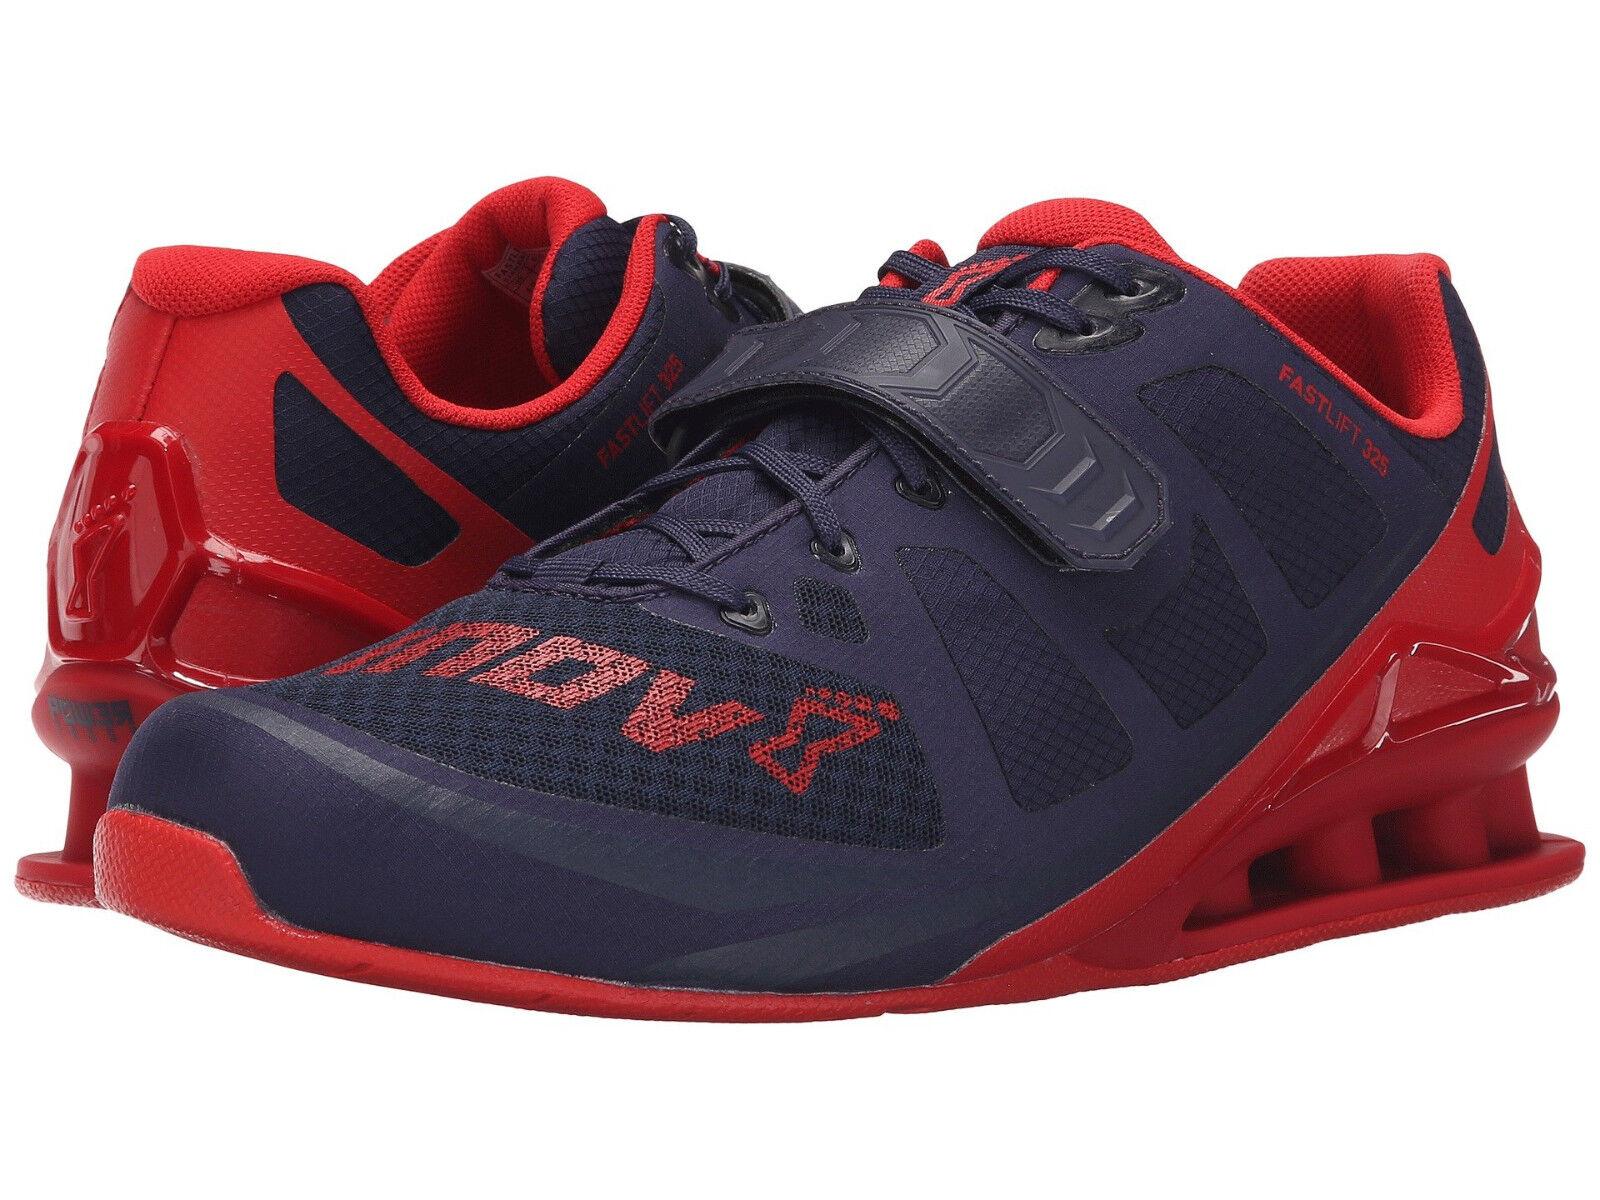 inov-8 hommes FastLift 325 US 14 M Navy Mesh Weightlifting Sneakers Chaussures 160.00